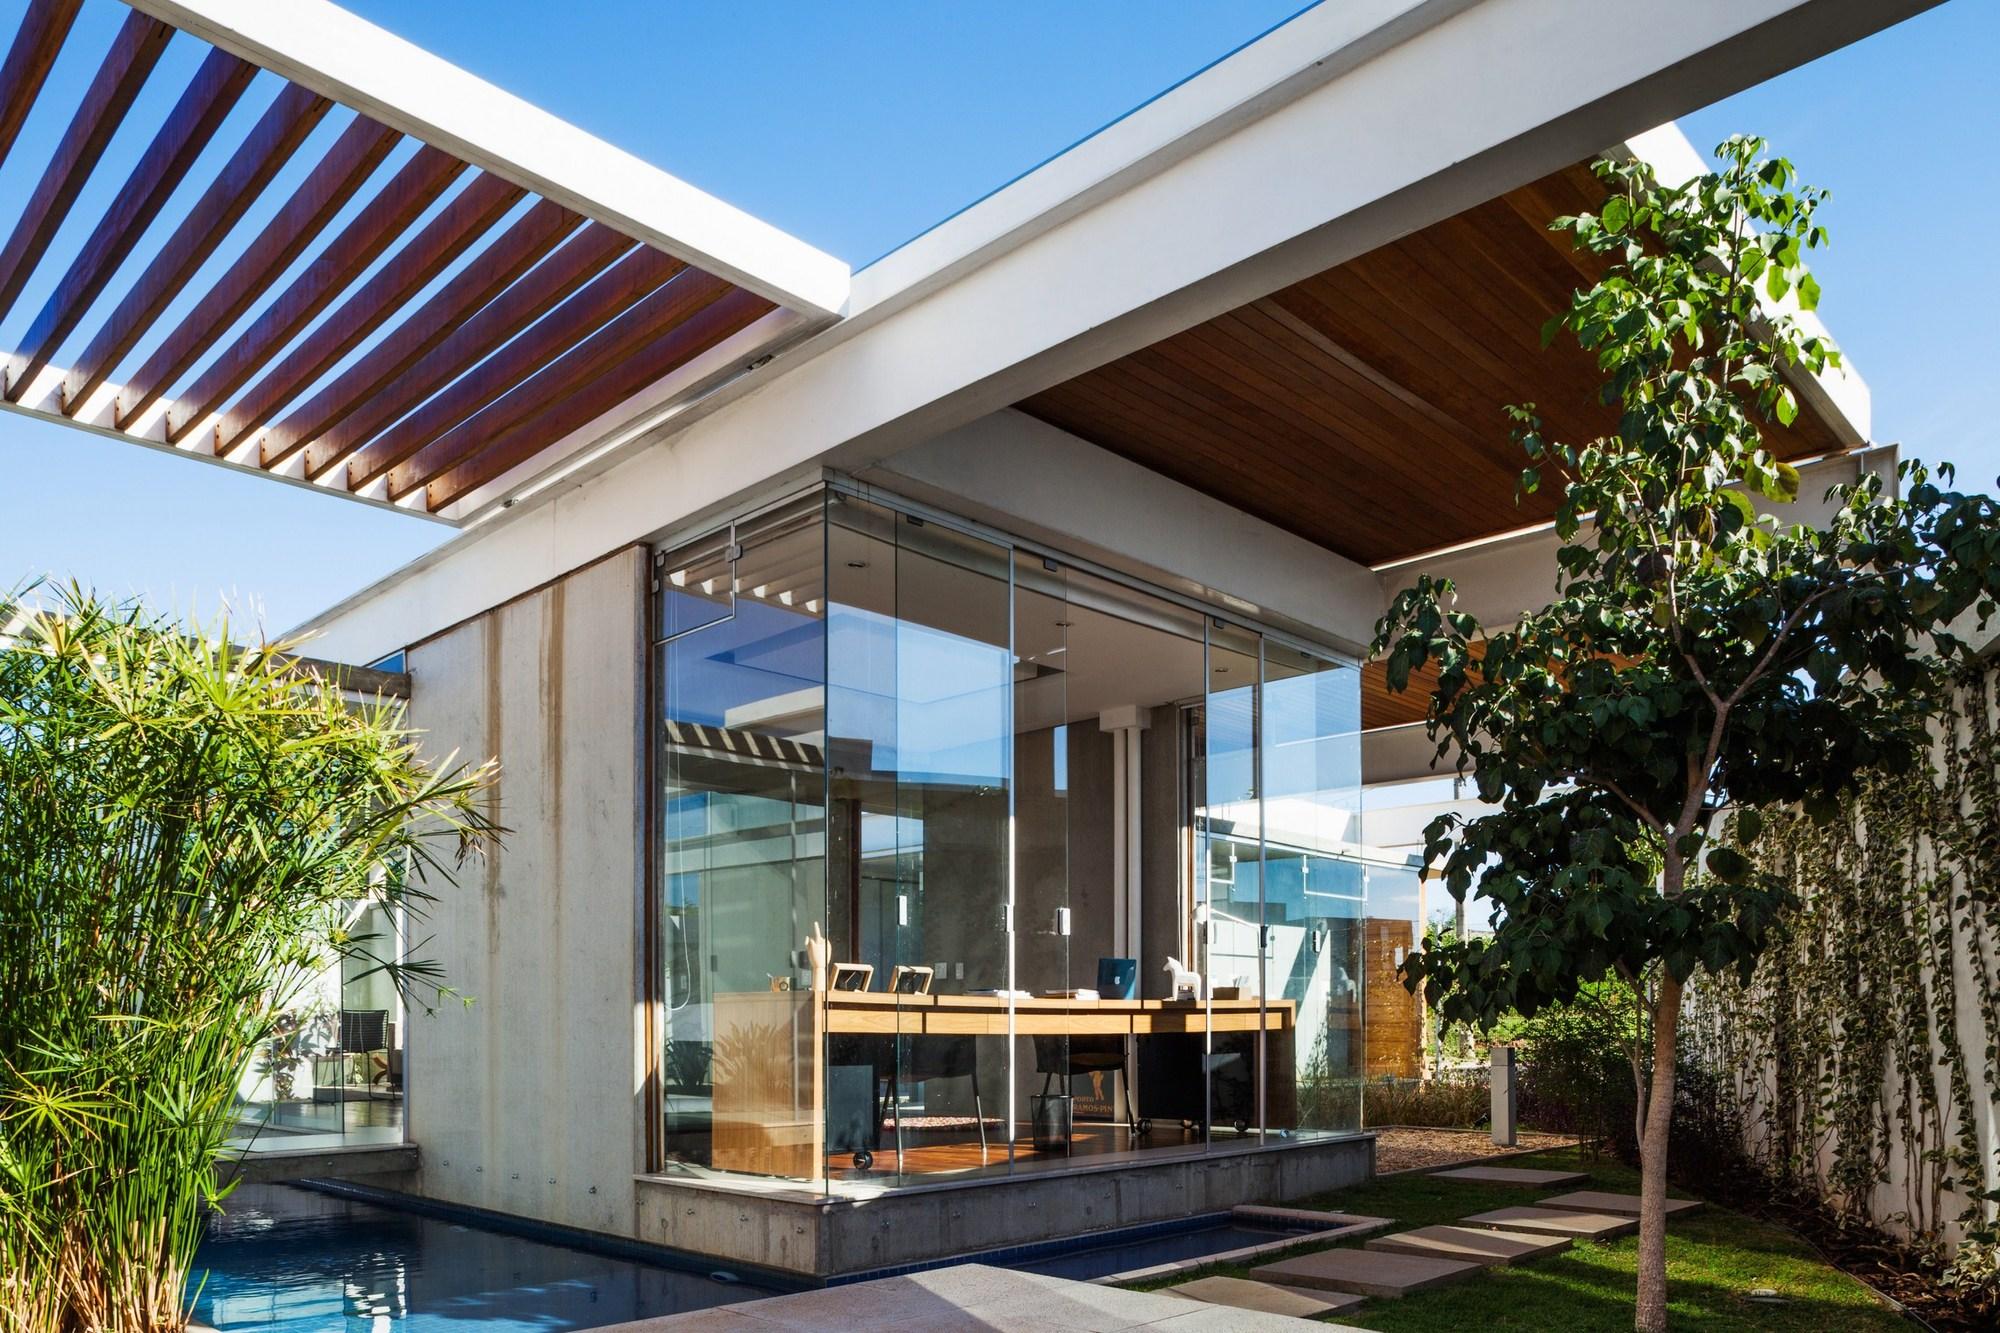 Casa de las Pérgolas Deslizantes / FGMF Arquitetos